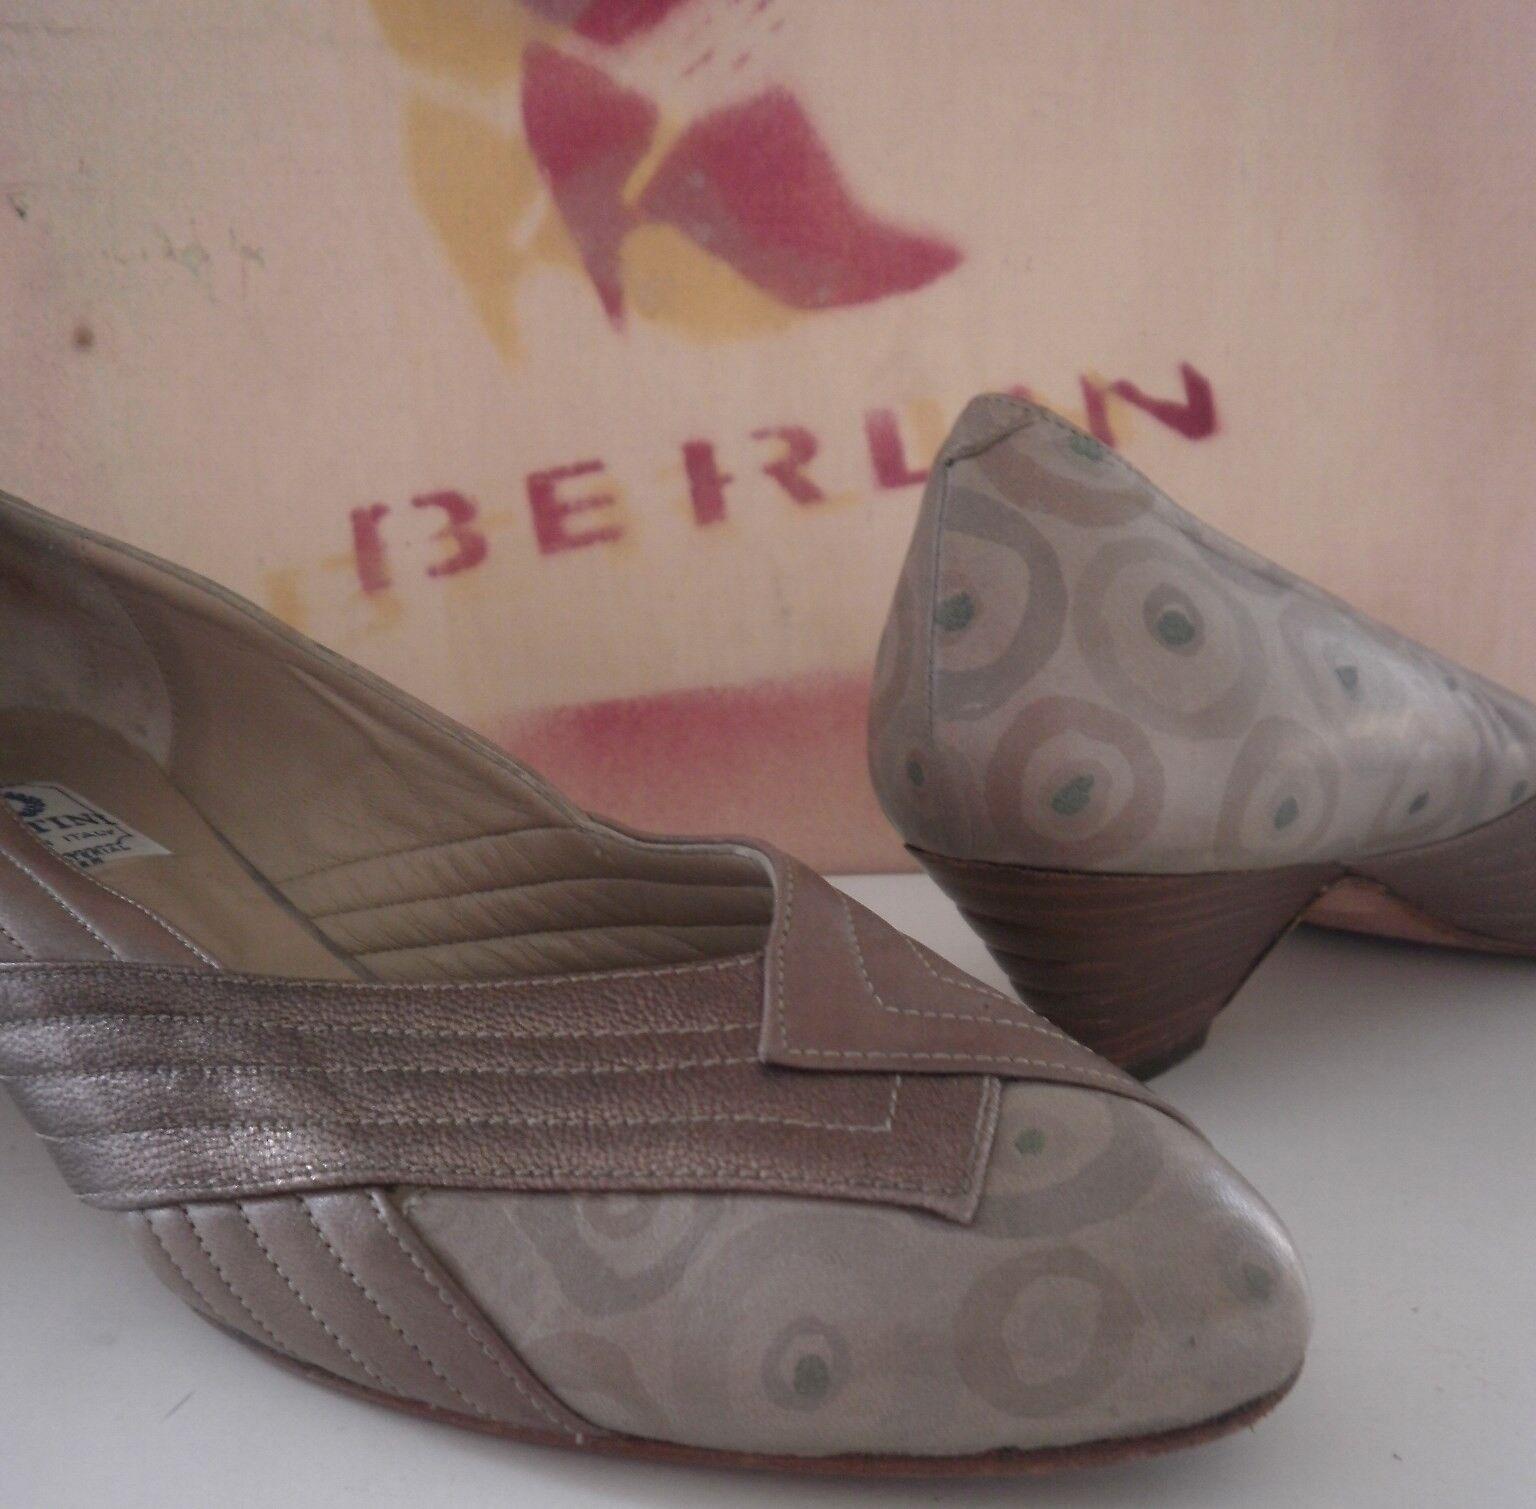 Bi Bi Bi bettini pumps zapatos párrafo plana metalizado made  90er True vintage 90s  te hará satisfecho